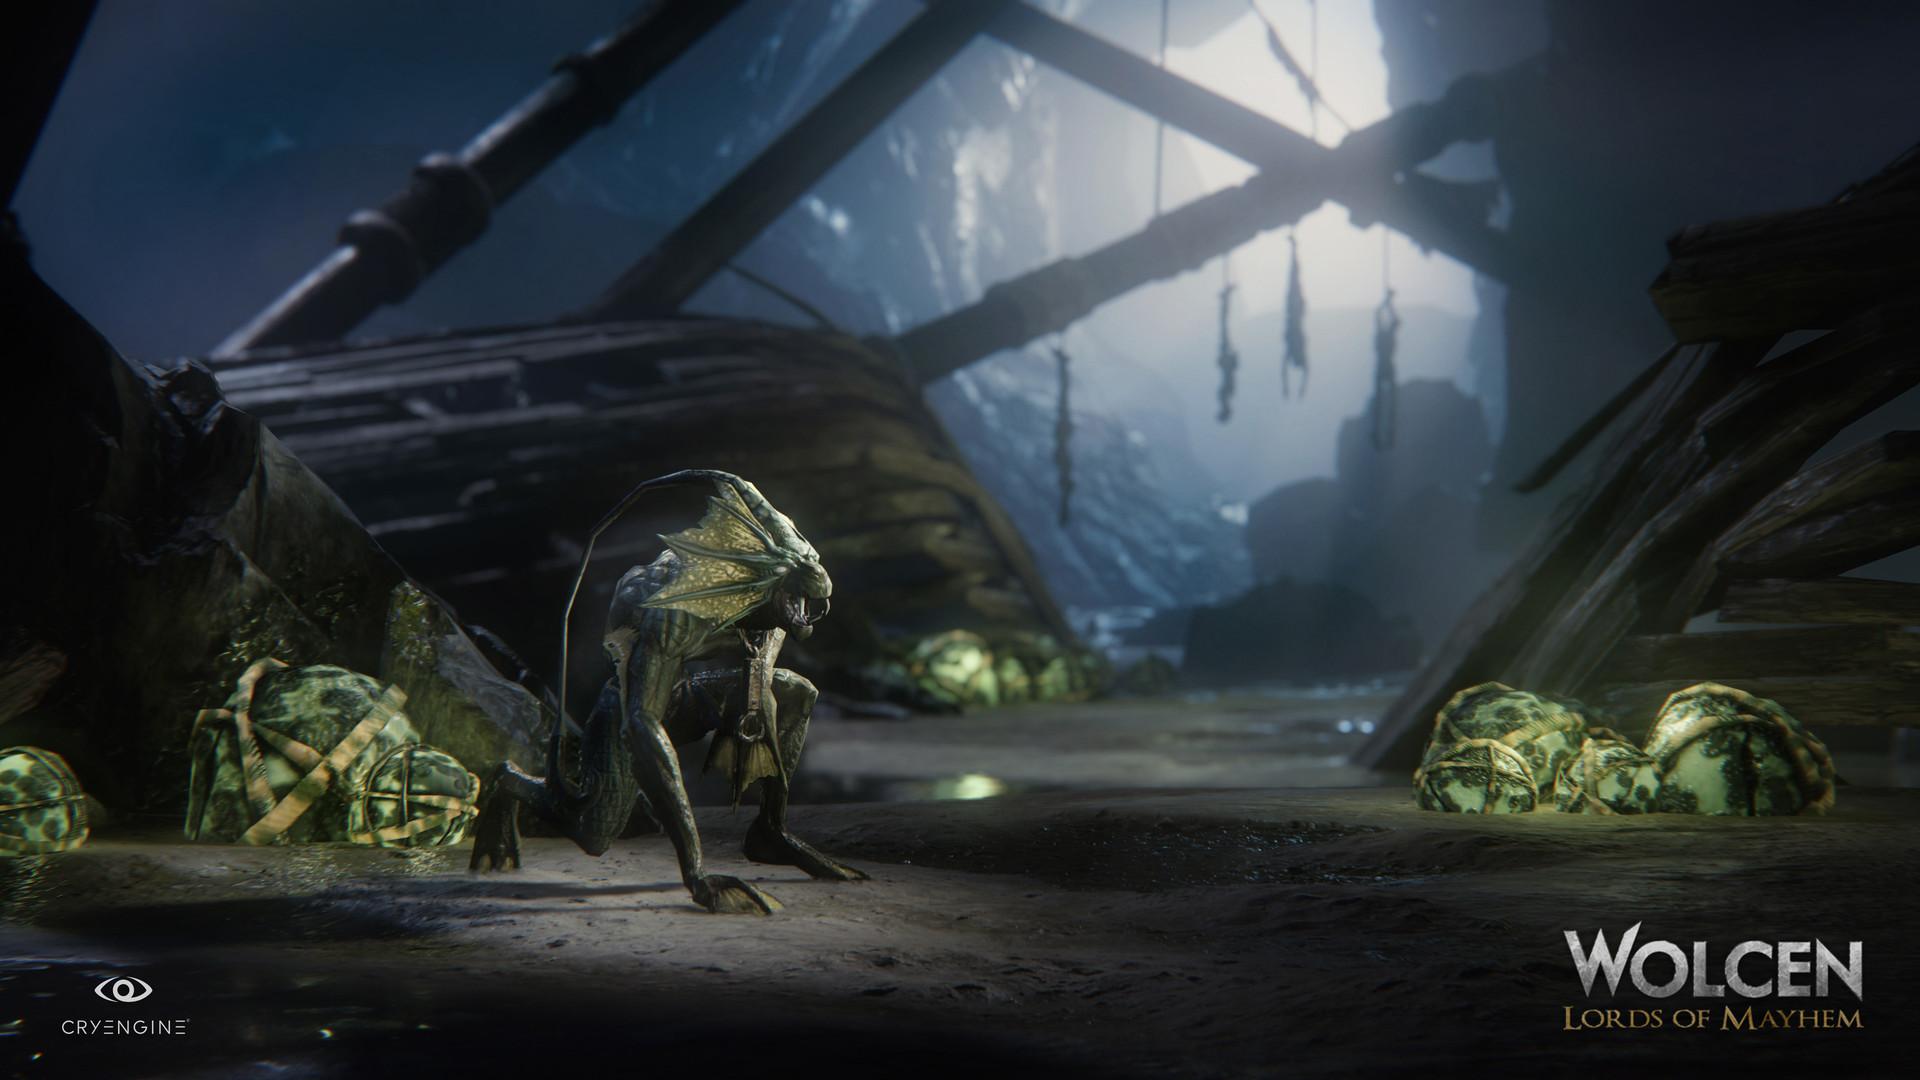 Wolcen Lords Of Mayhem On Steam